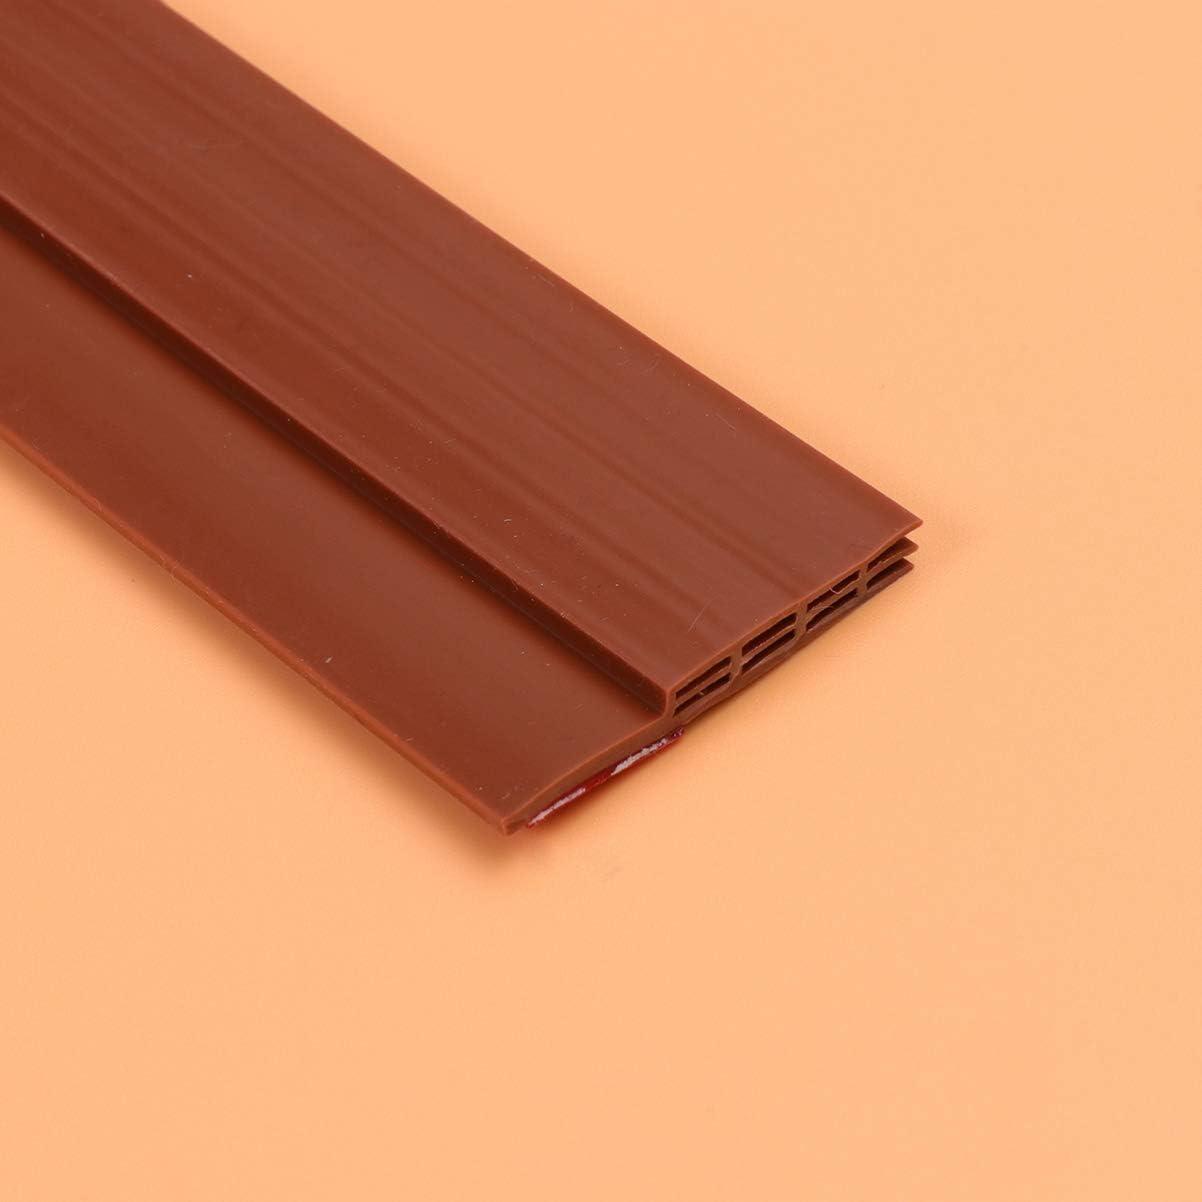 BESPORTBLE Holzt/ürschlitz-Dichtleiste T/ürboden-Dichtleiste Schallschutzleiste Braun